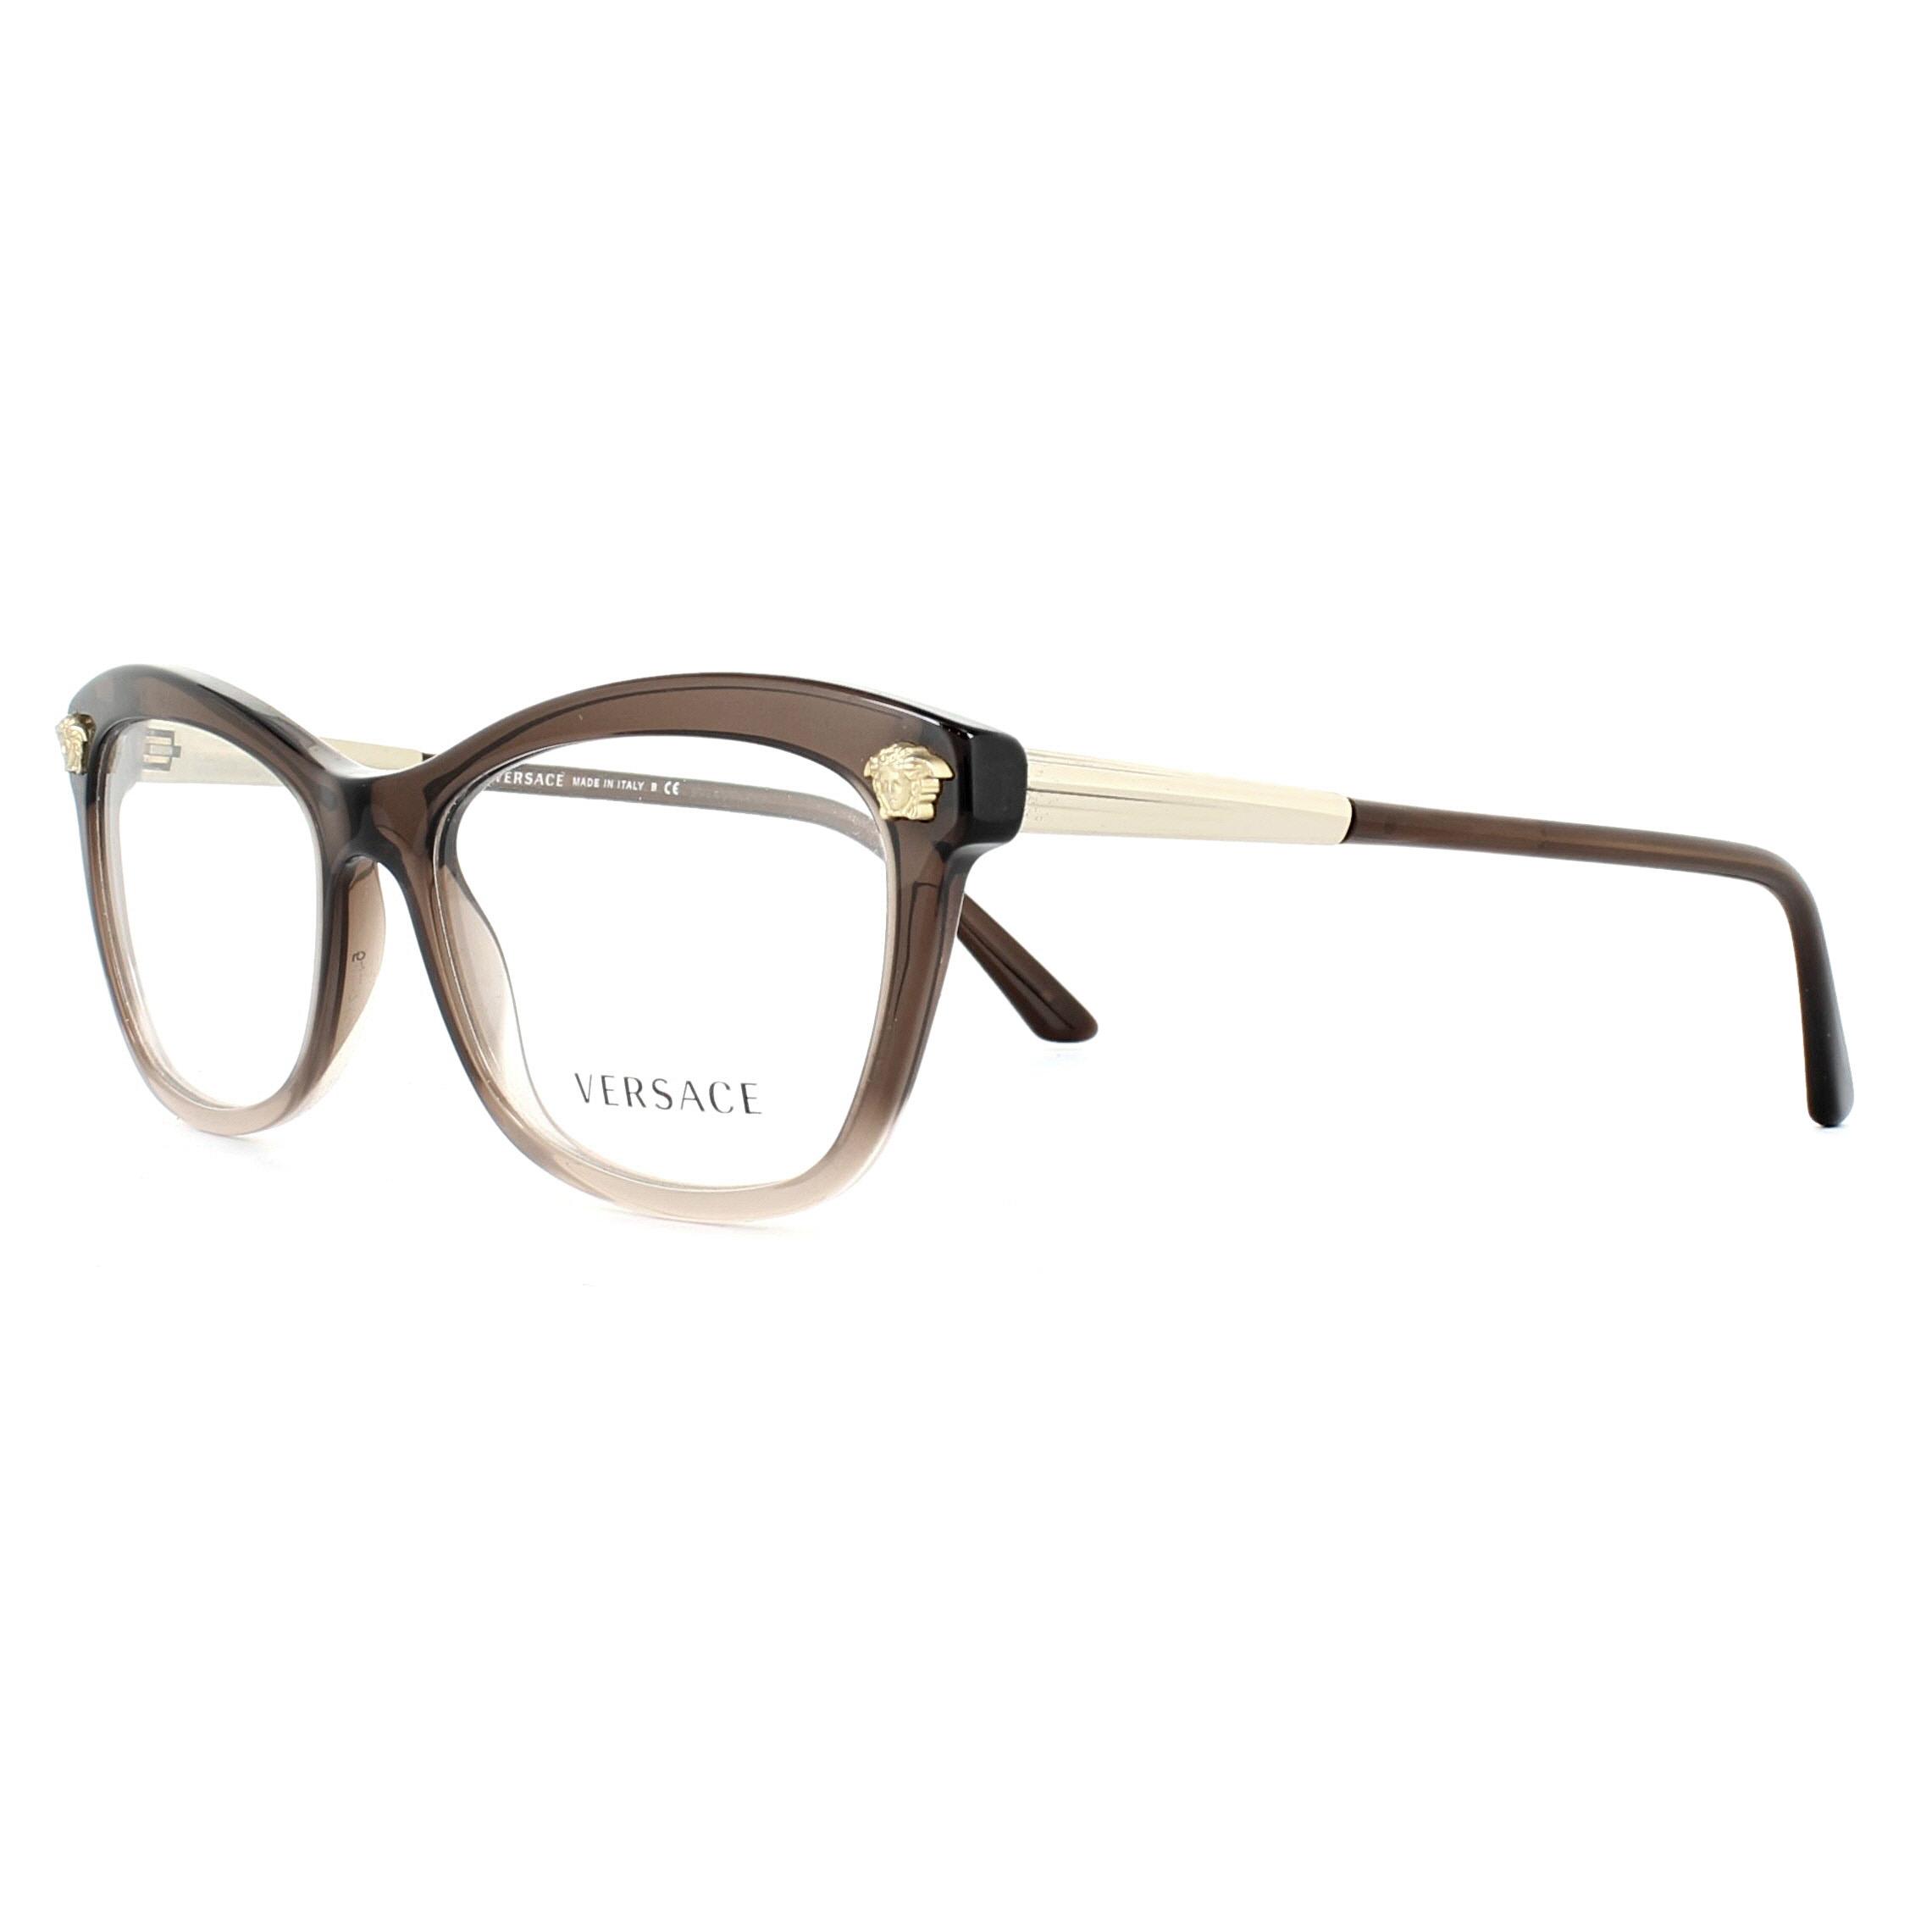 4e9feaff9ddd Sentinel Versace Glasses Frames 3224 5165 Brown Lilac Transparent 54mm  Womens